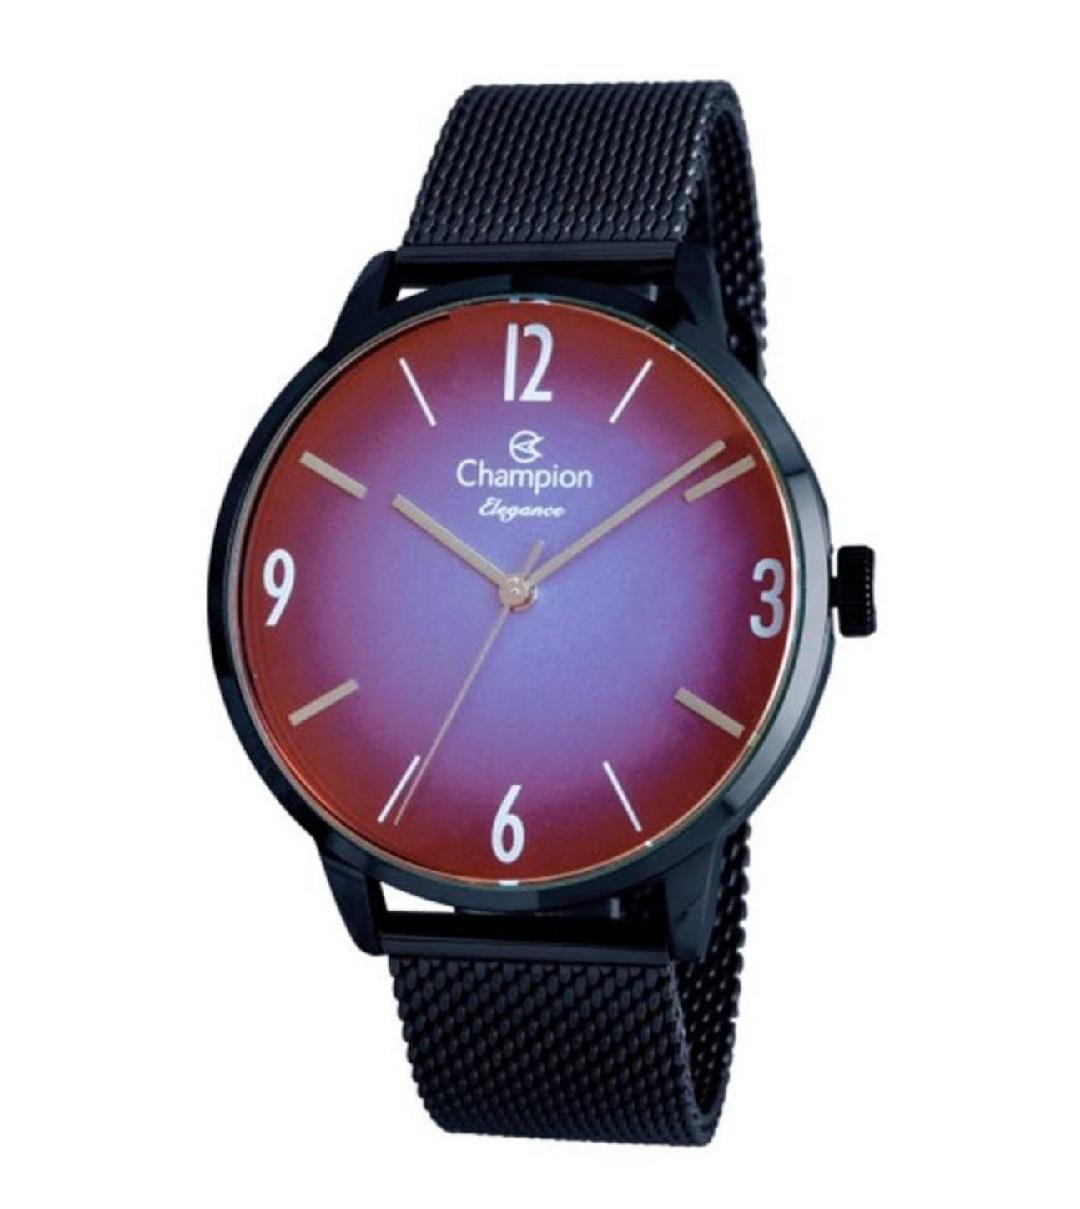 Relógio Champion Elegance Feminino Marrom CN20837K